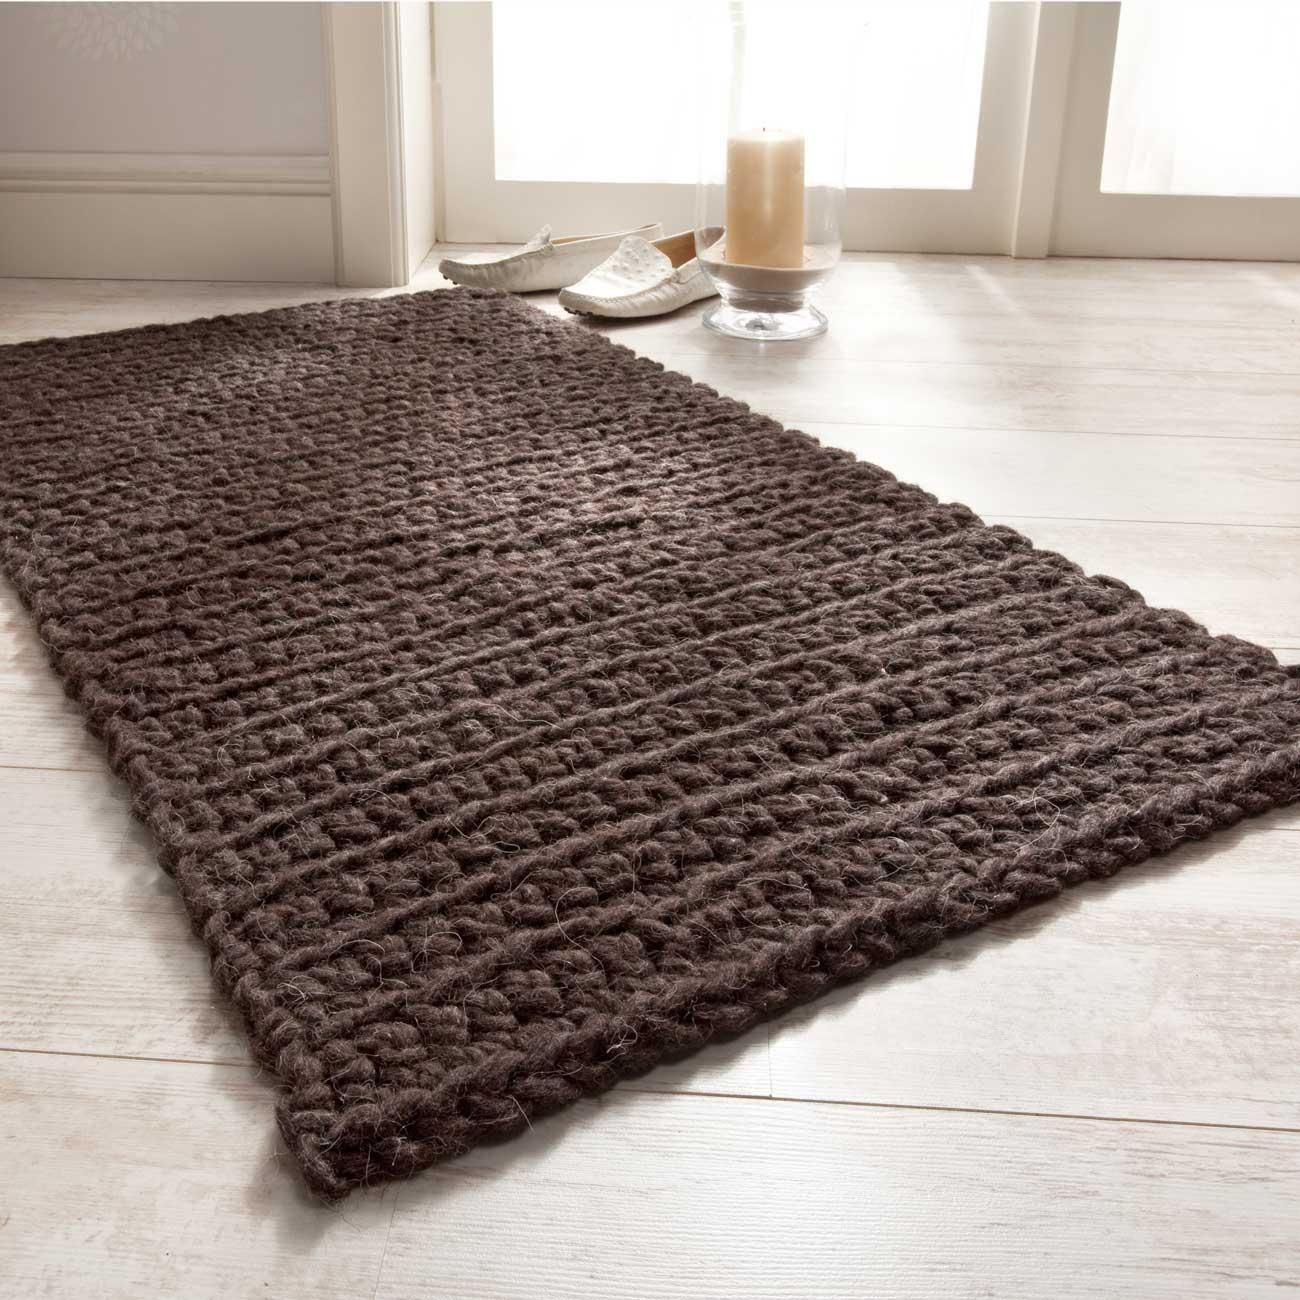 teppich selber machen anleitung hledat googlem teppich pinterest teppich h keln selber. Black Bedroom Furniture Sets. Home Design Ideas